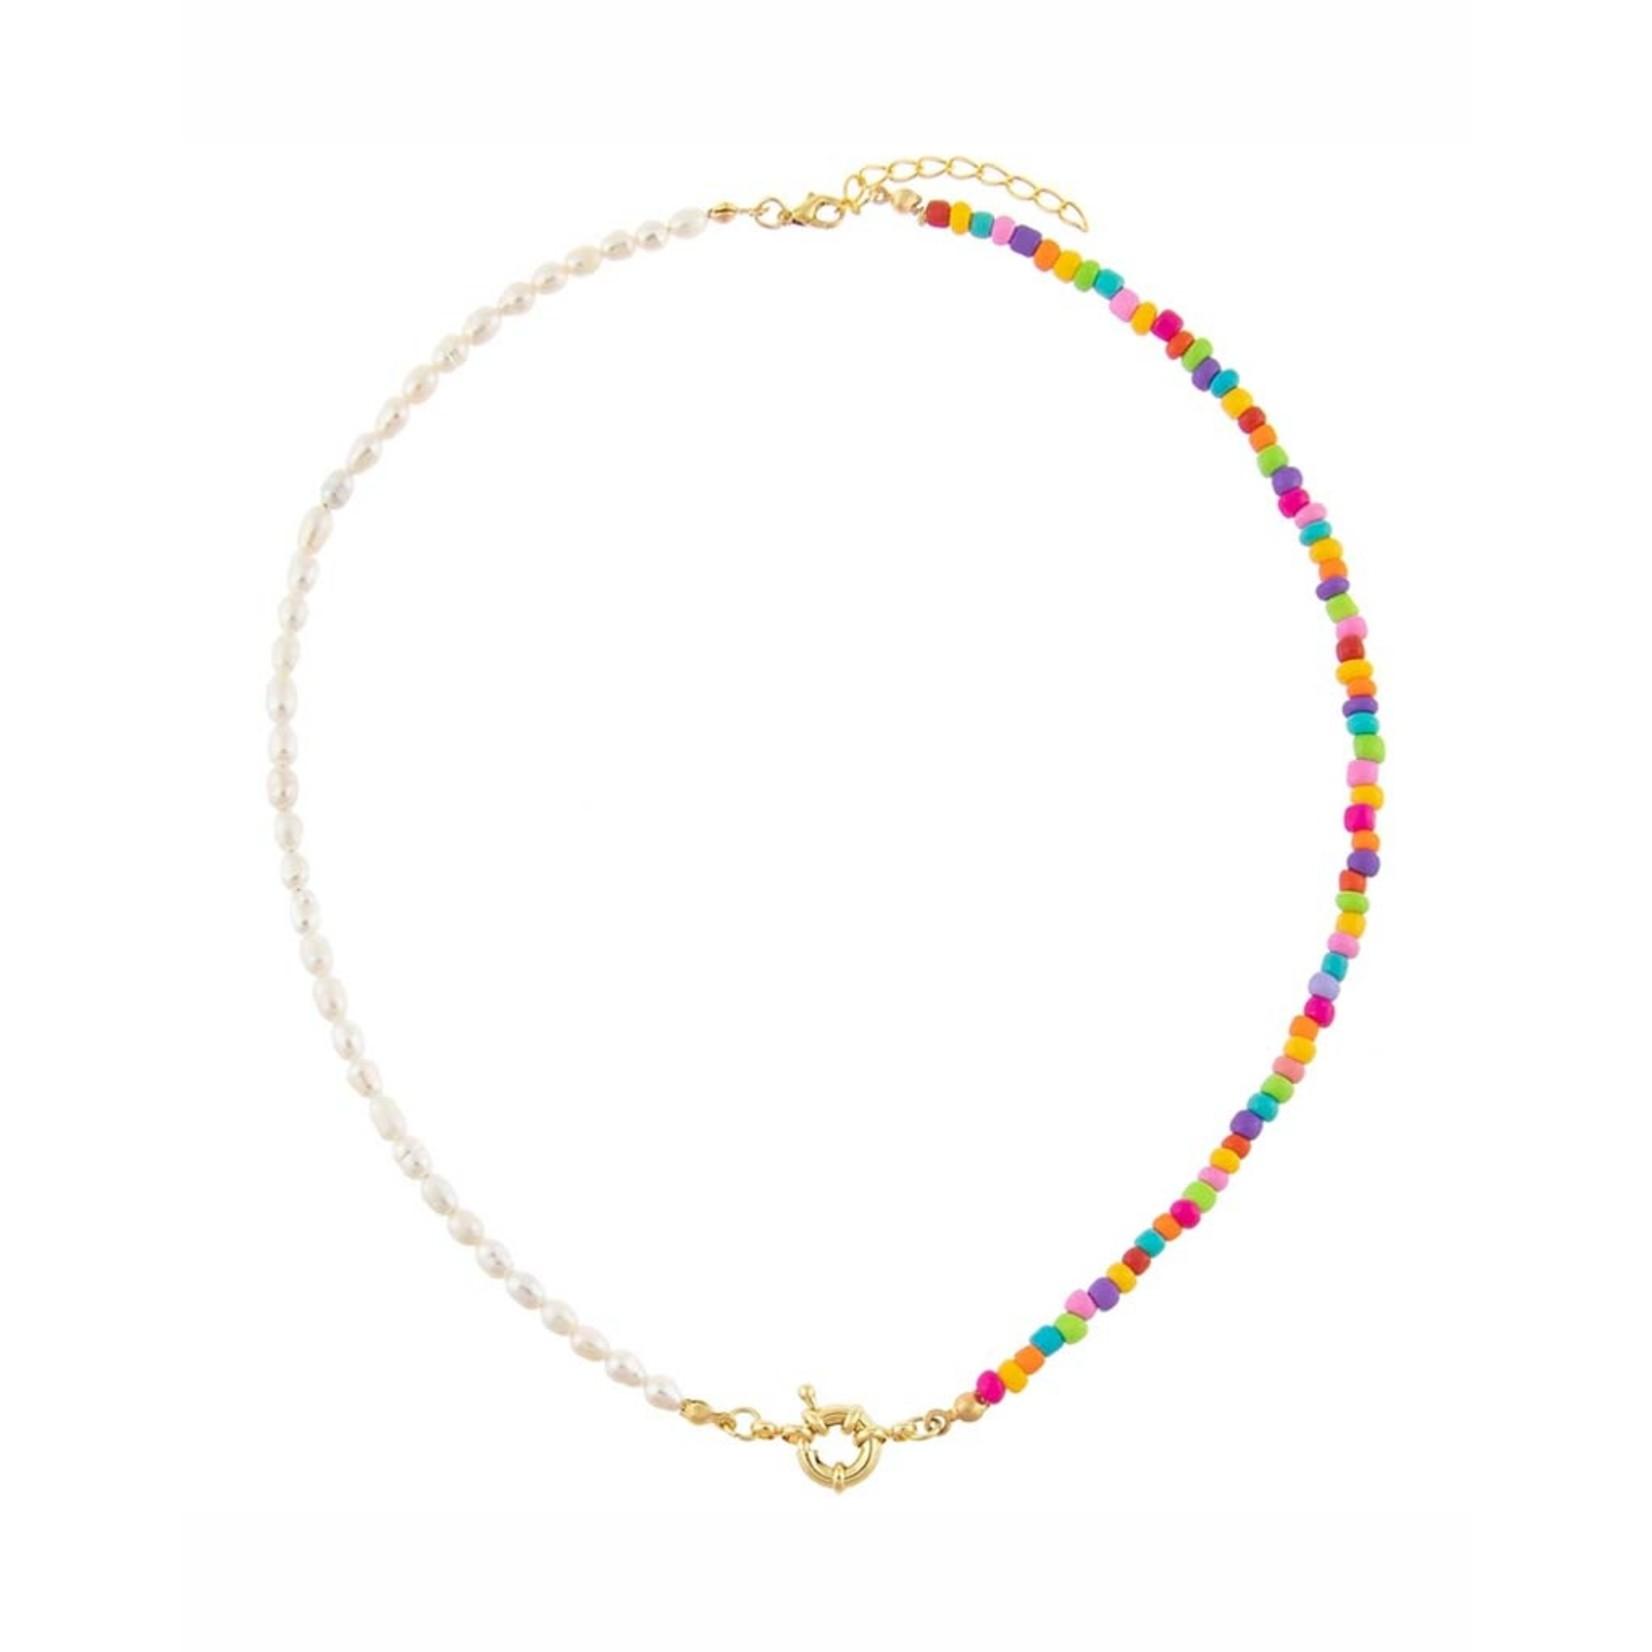 Adinas Colored Bead X Pearl Toggle Necklace